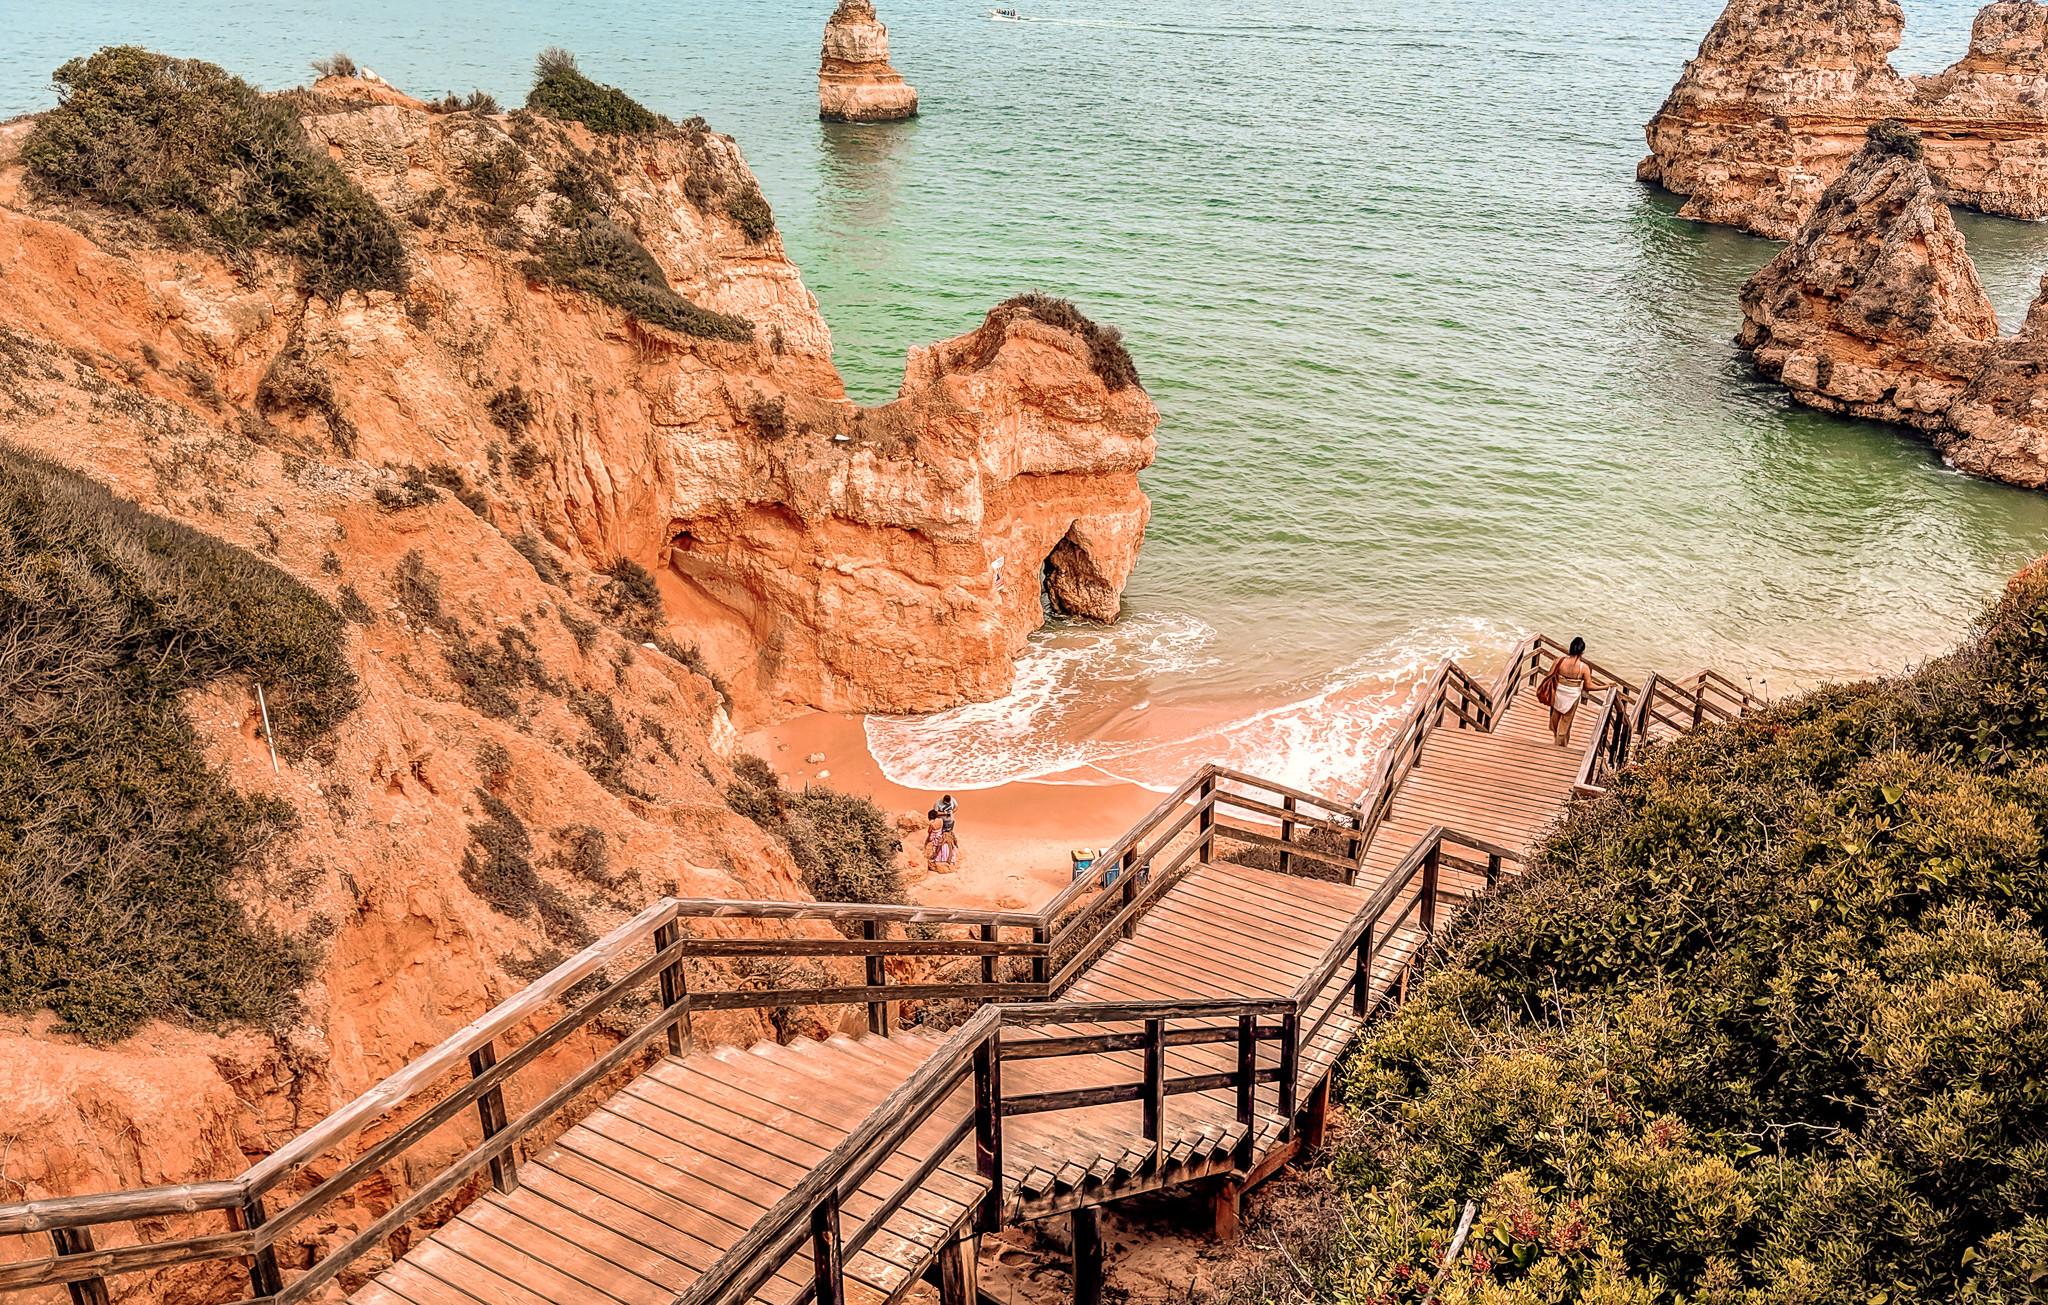 Praia do Camilo Stairs